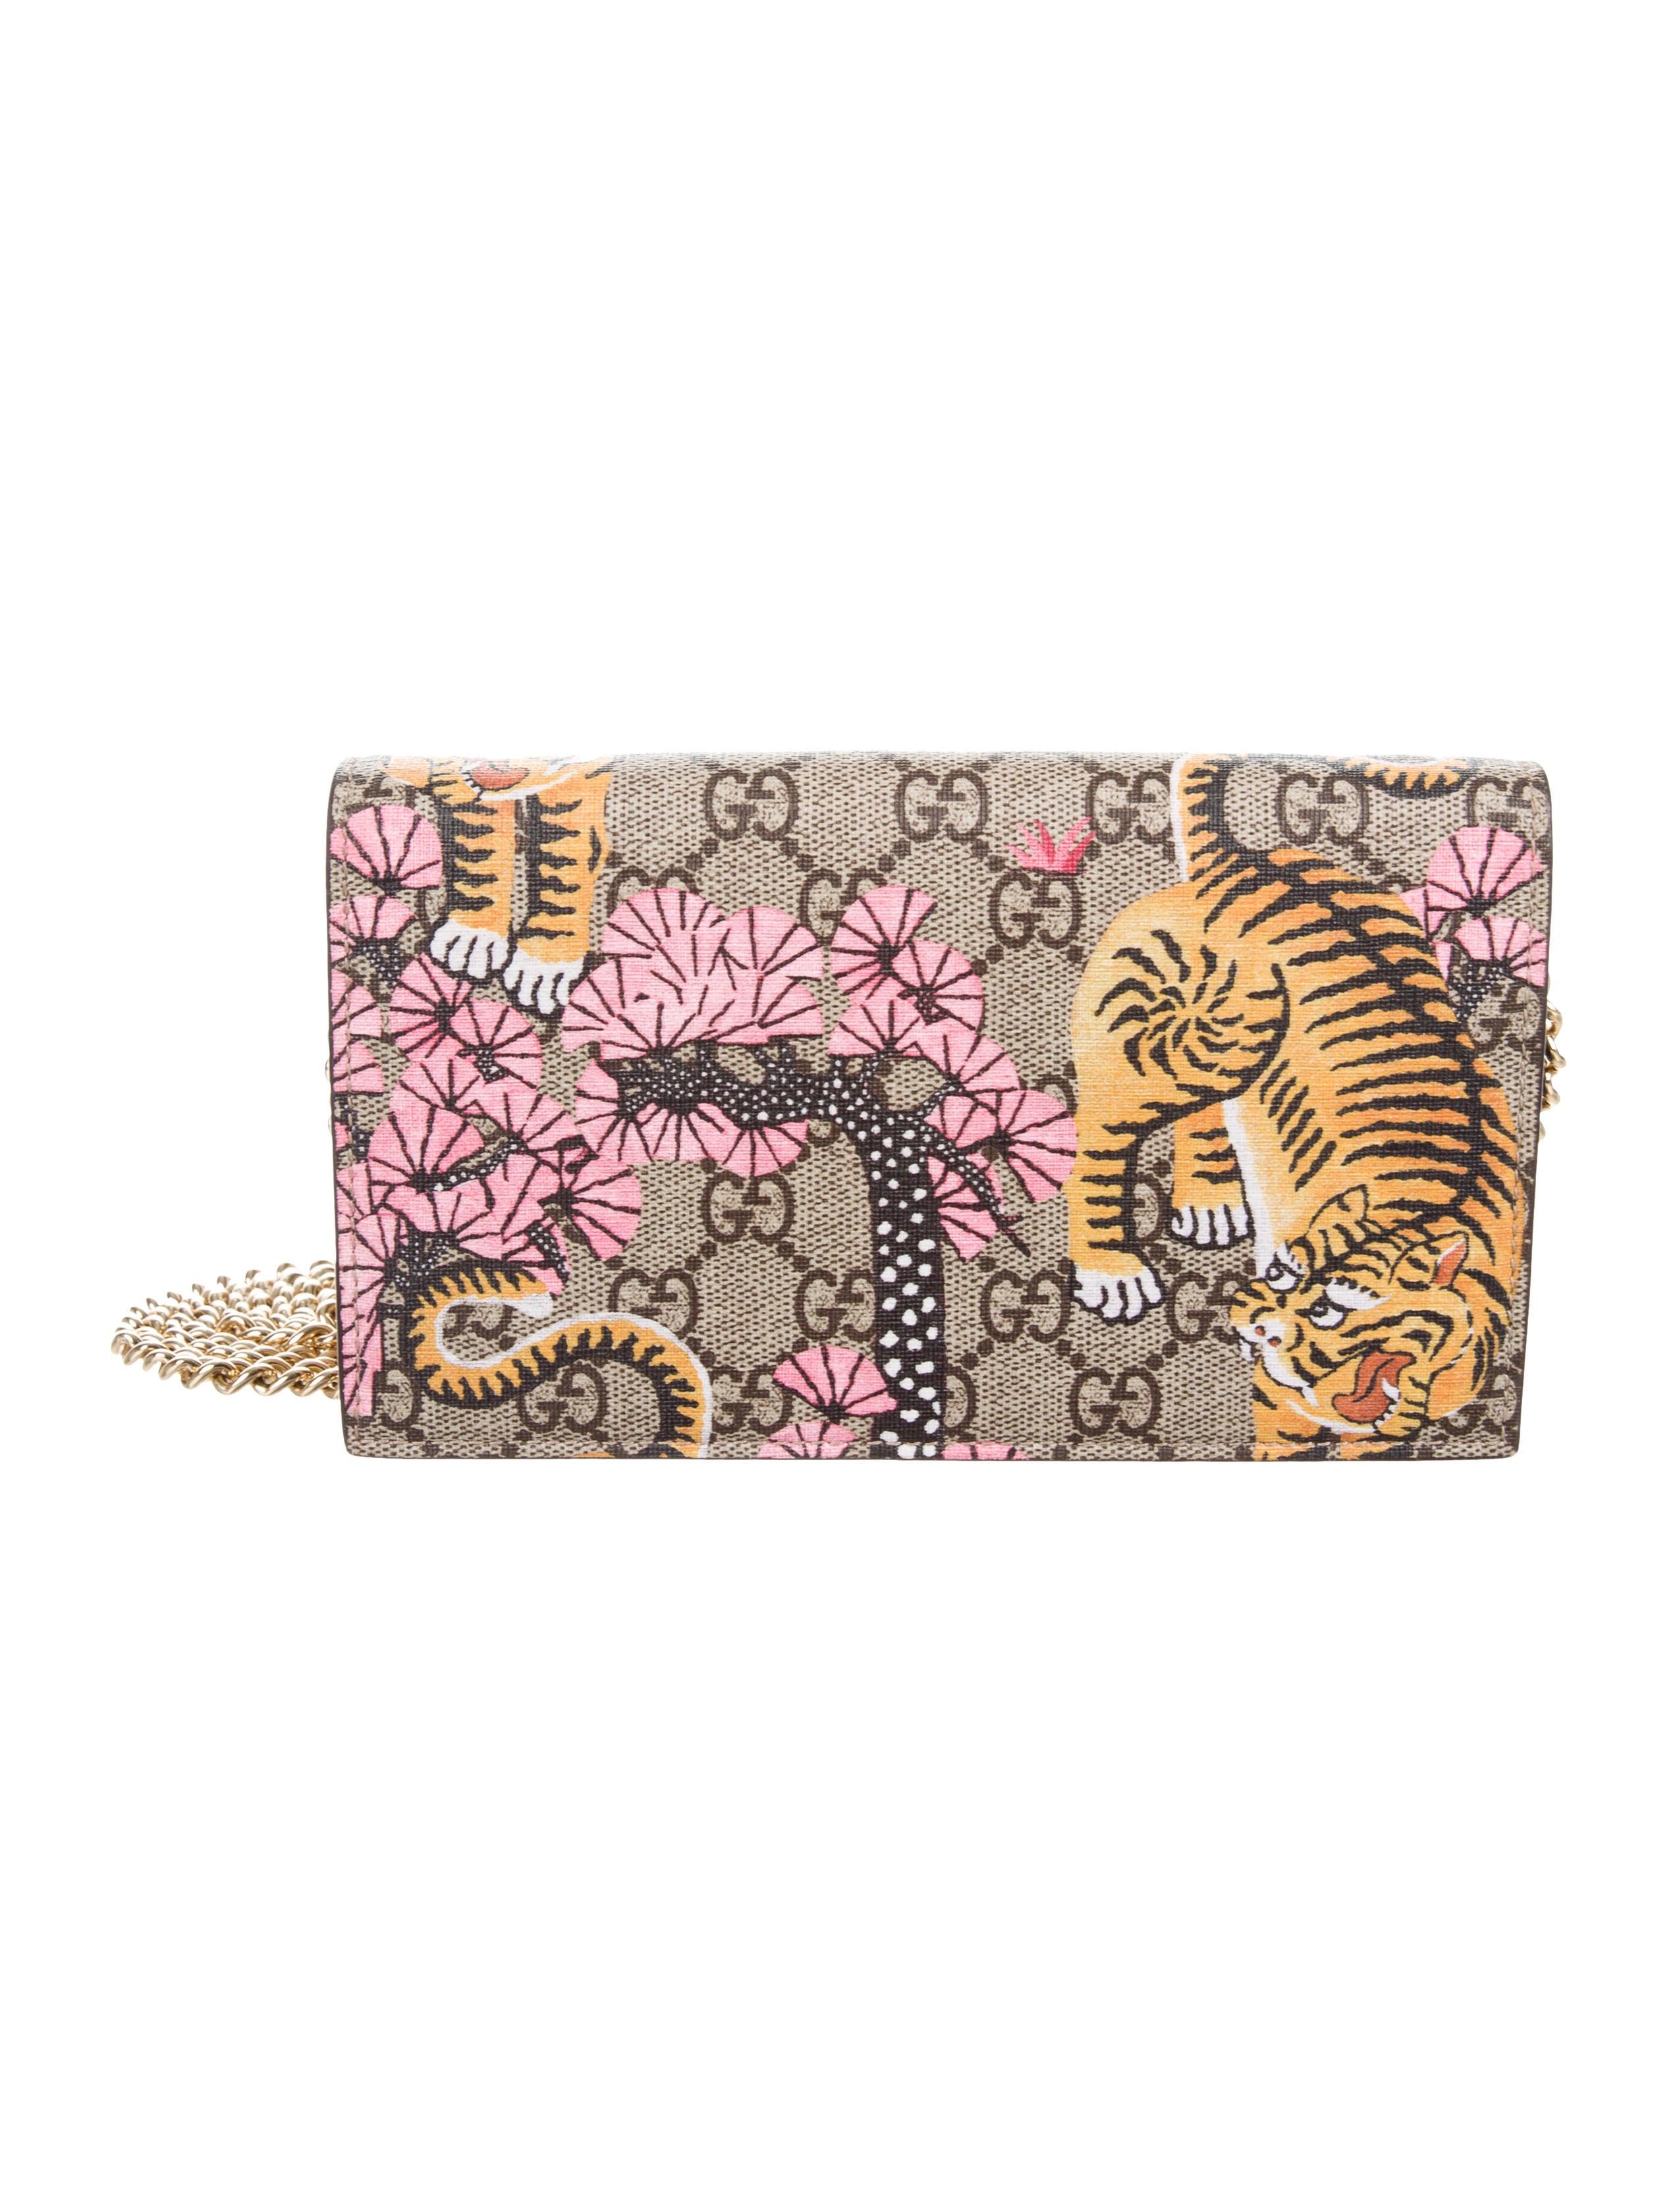 8a0be425500291 Gucci 2016 GG Supreme Bengal Chain Wallet - Handbags - GUC182342 ...